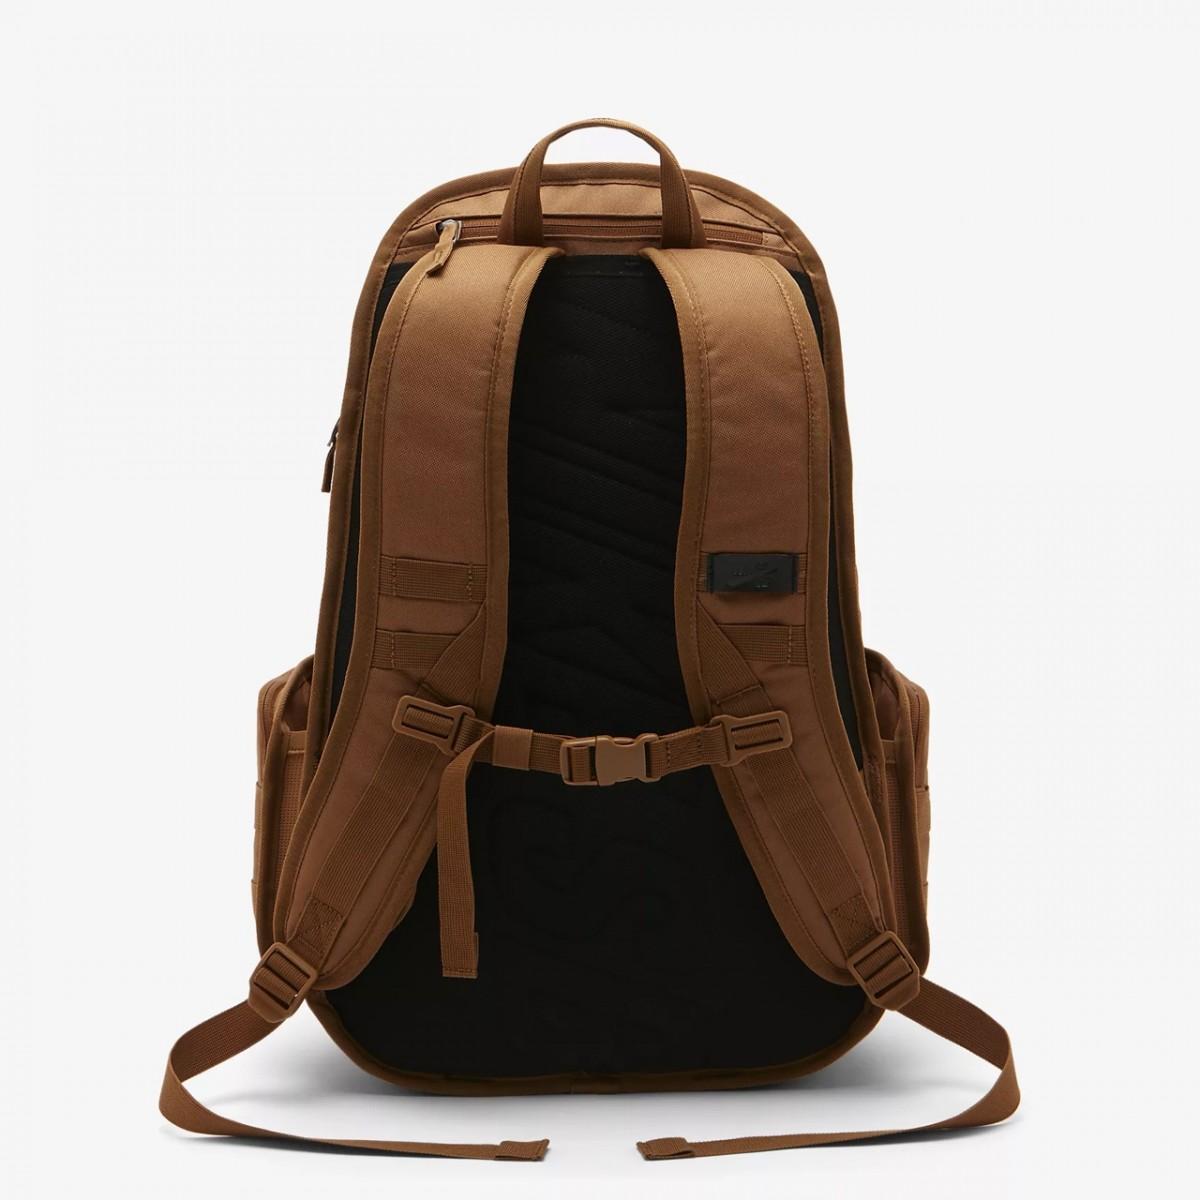 Nike SB Backpack 'Camel' BA5403-234